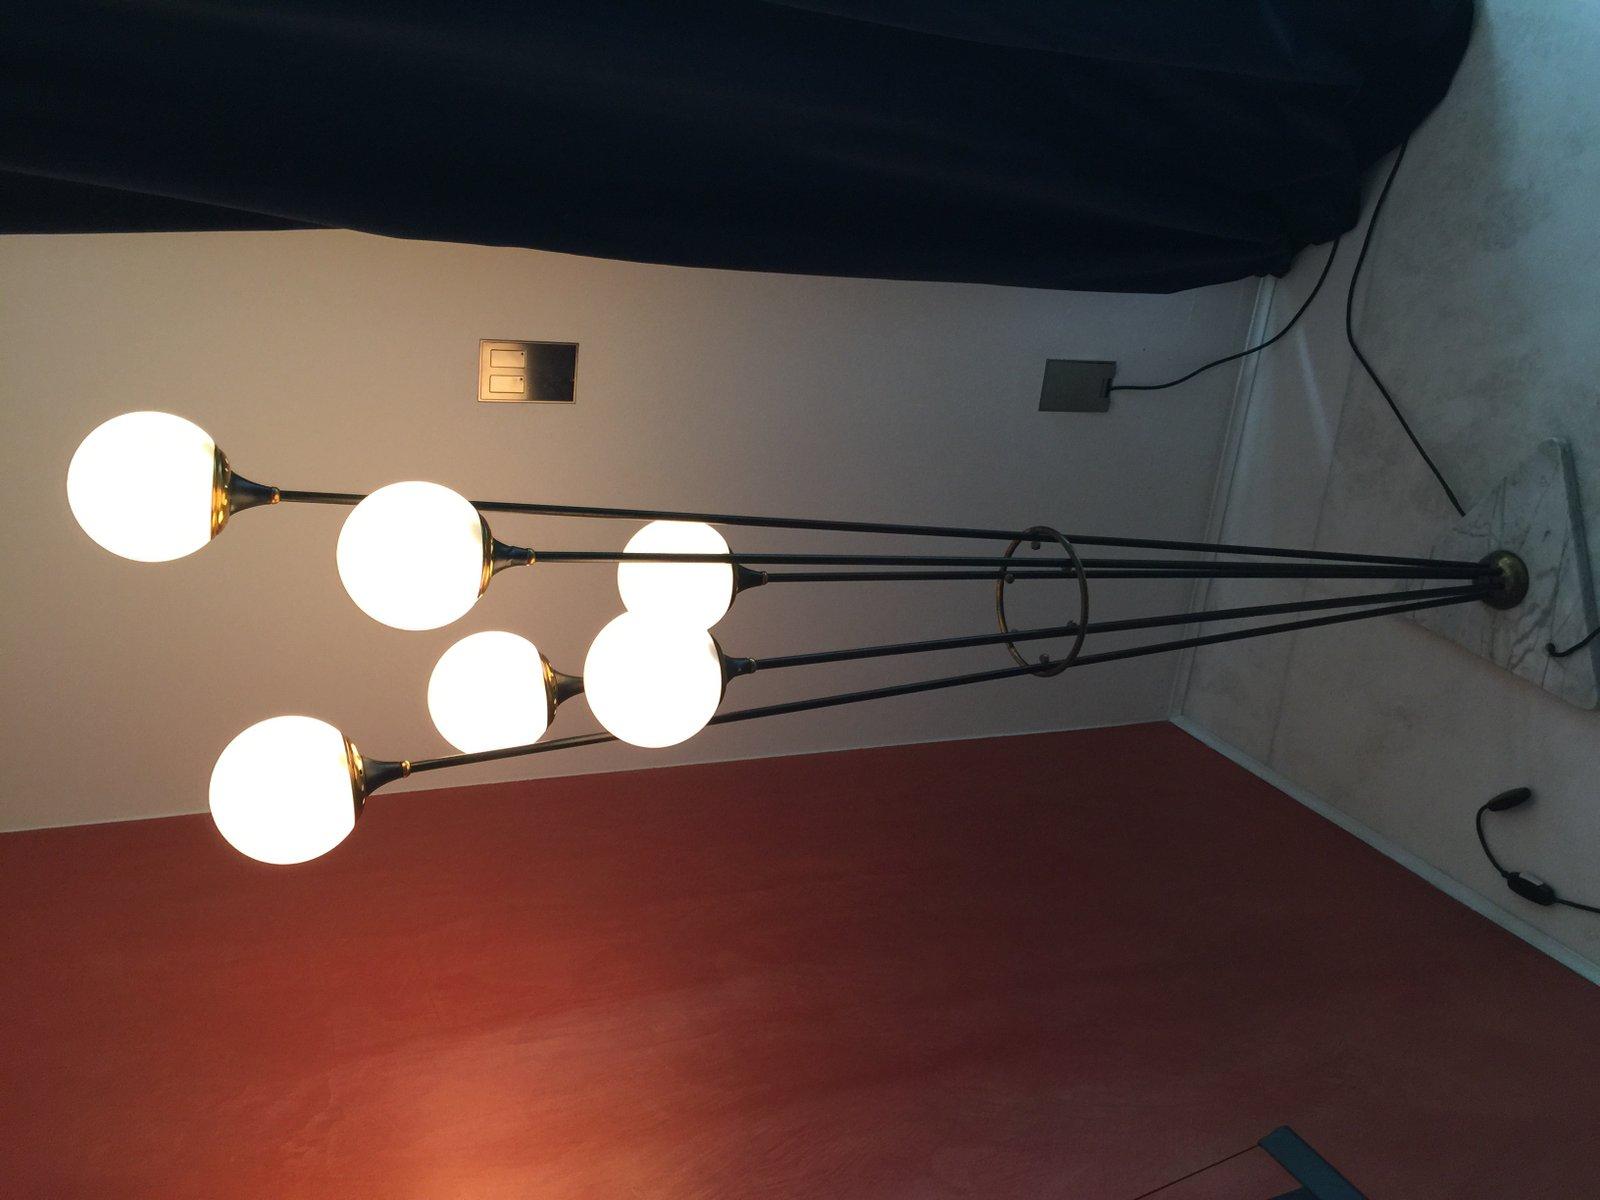 lampadaire arabello de stilnovo 1950s en vente sur pamono. Black Bedroom Furniture Sets. Home Design Ideas